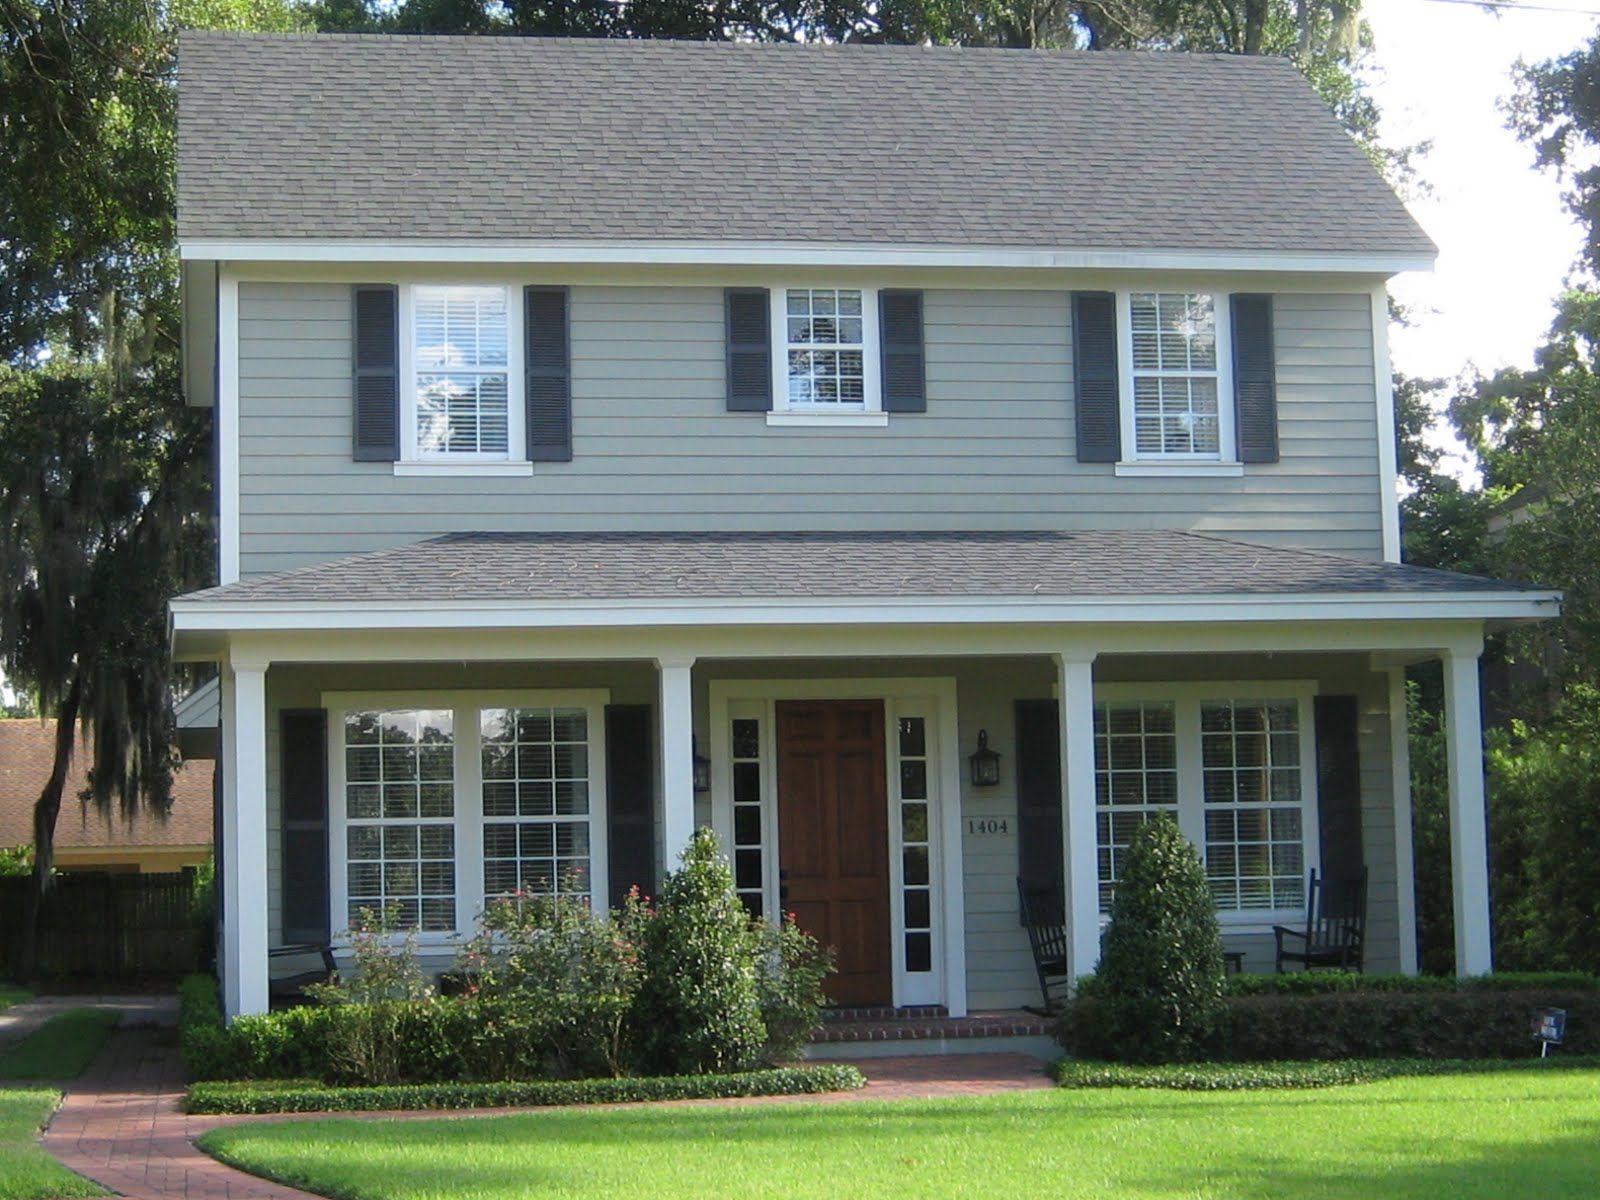 Astounding 17 Best Images About Exterior House Color On Pinterest Exterior Largest Home Design Picture Inspirations Pitcheantrous